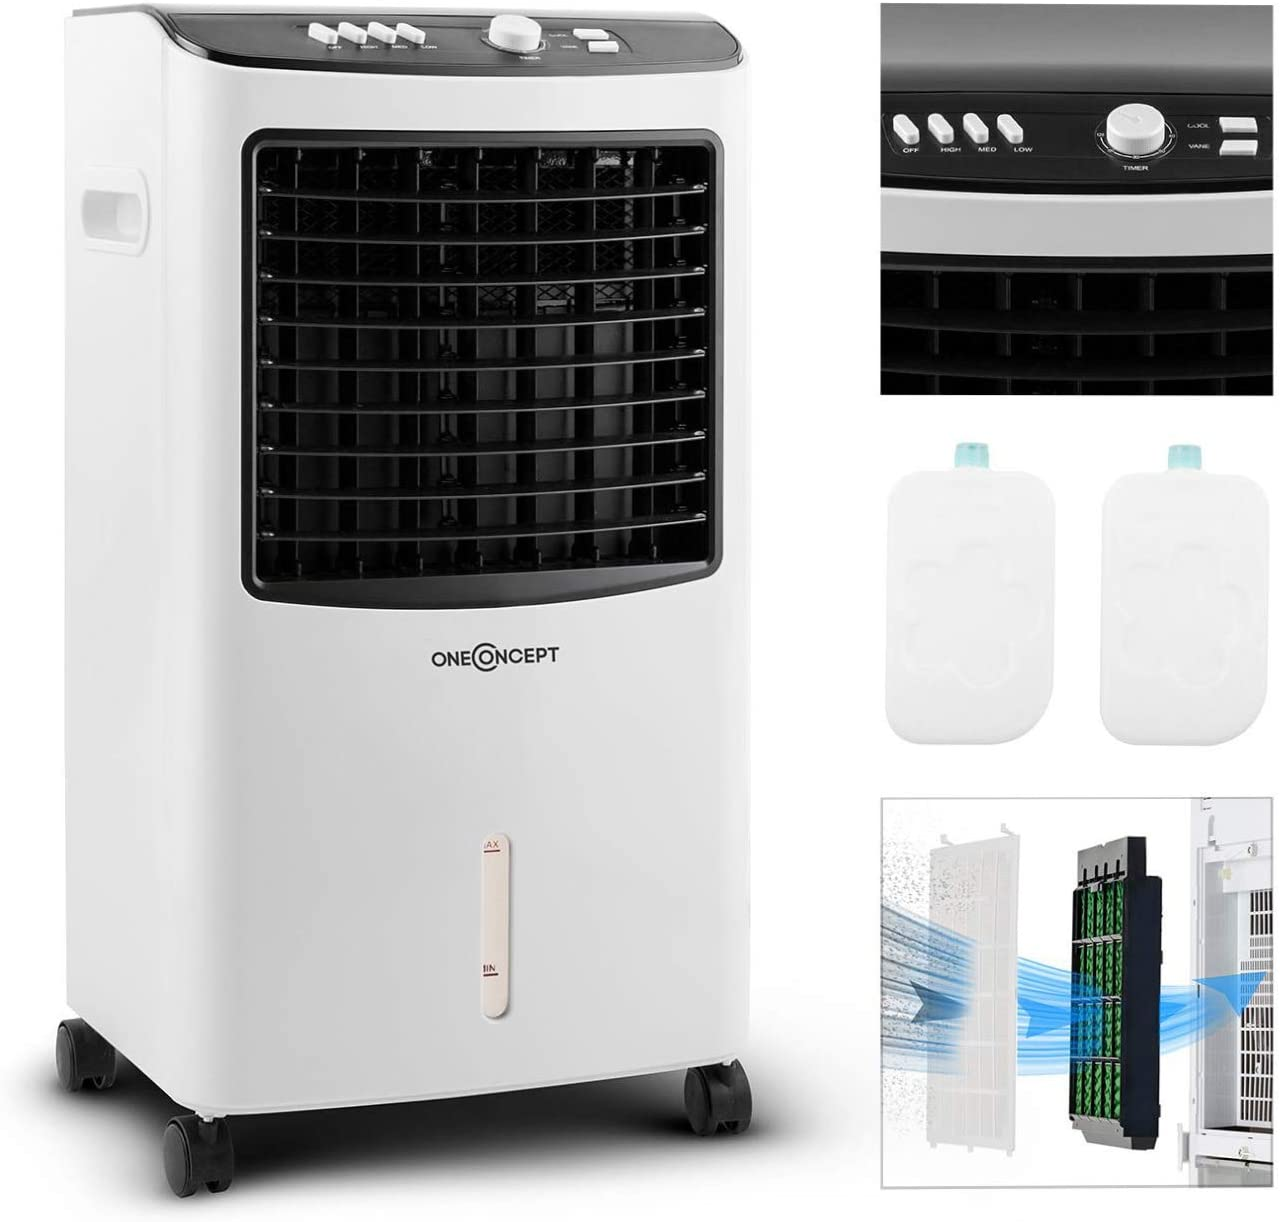 oneConcept MCH-2 V2 - Ventilador 3-en-1 portátil, Enfriador de aire, Humidificador, Tanque 7 L, 360 m³/h, 65 W, 2 baterías de refrigeración, Oscilación horizontal, Temporizador, Blanco seda